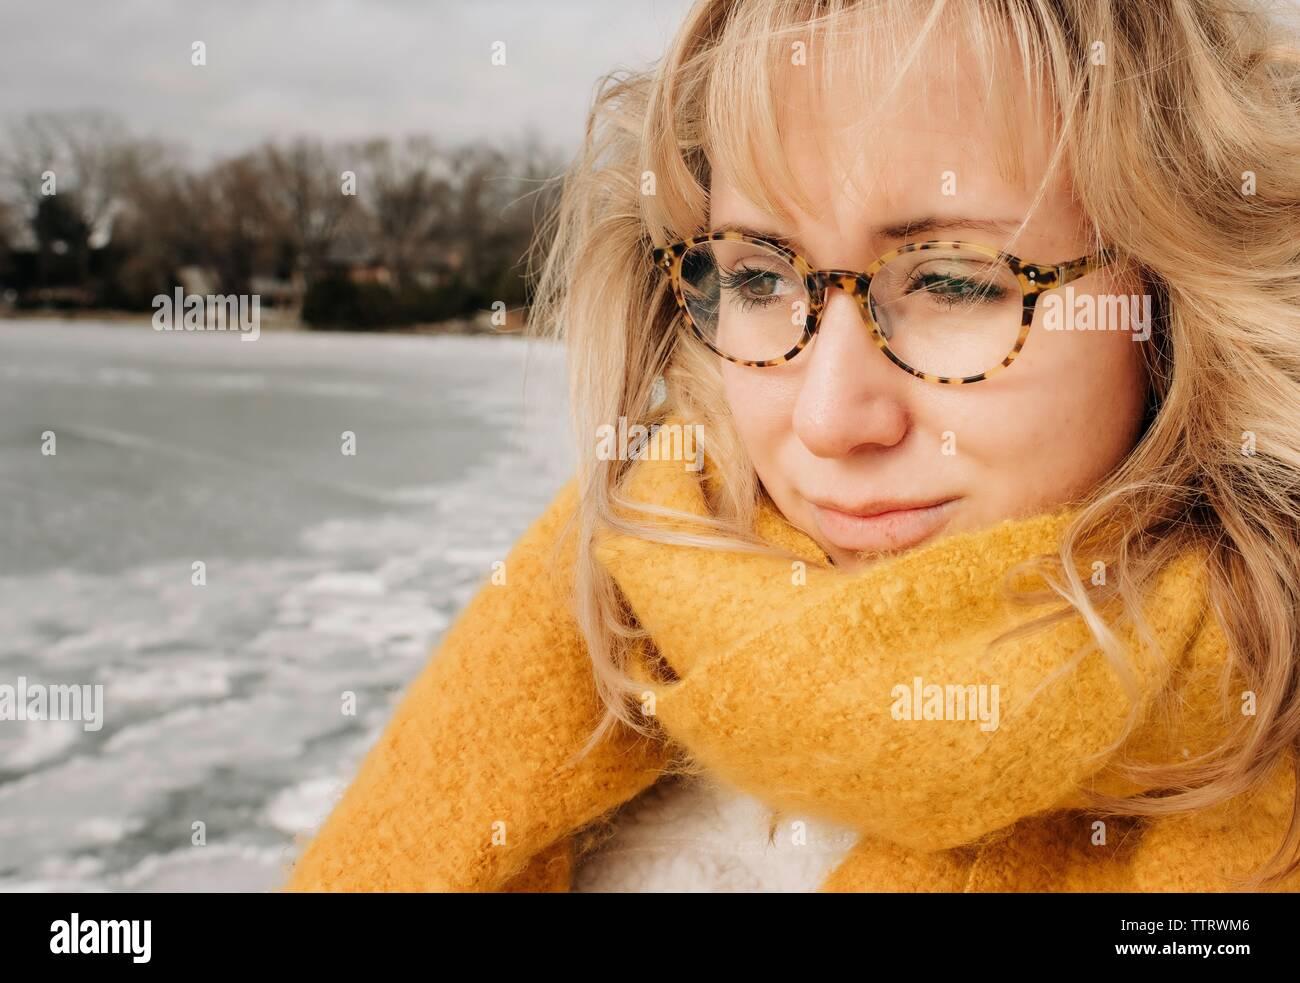 Retrato de mujer rubia con gafas mirando al agua sonriendo Foto de stock